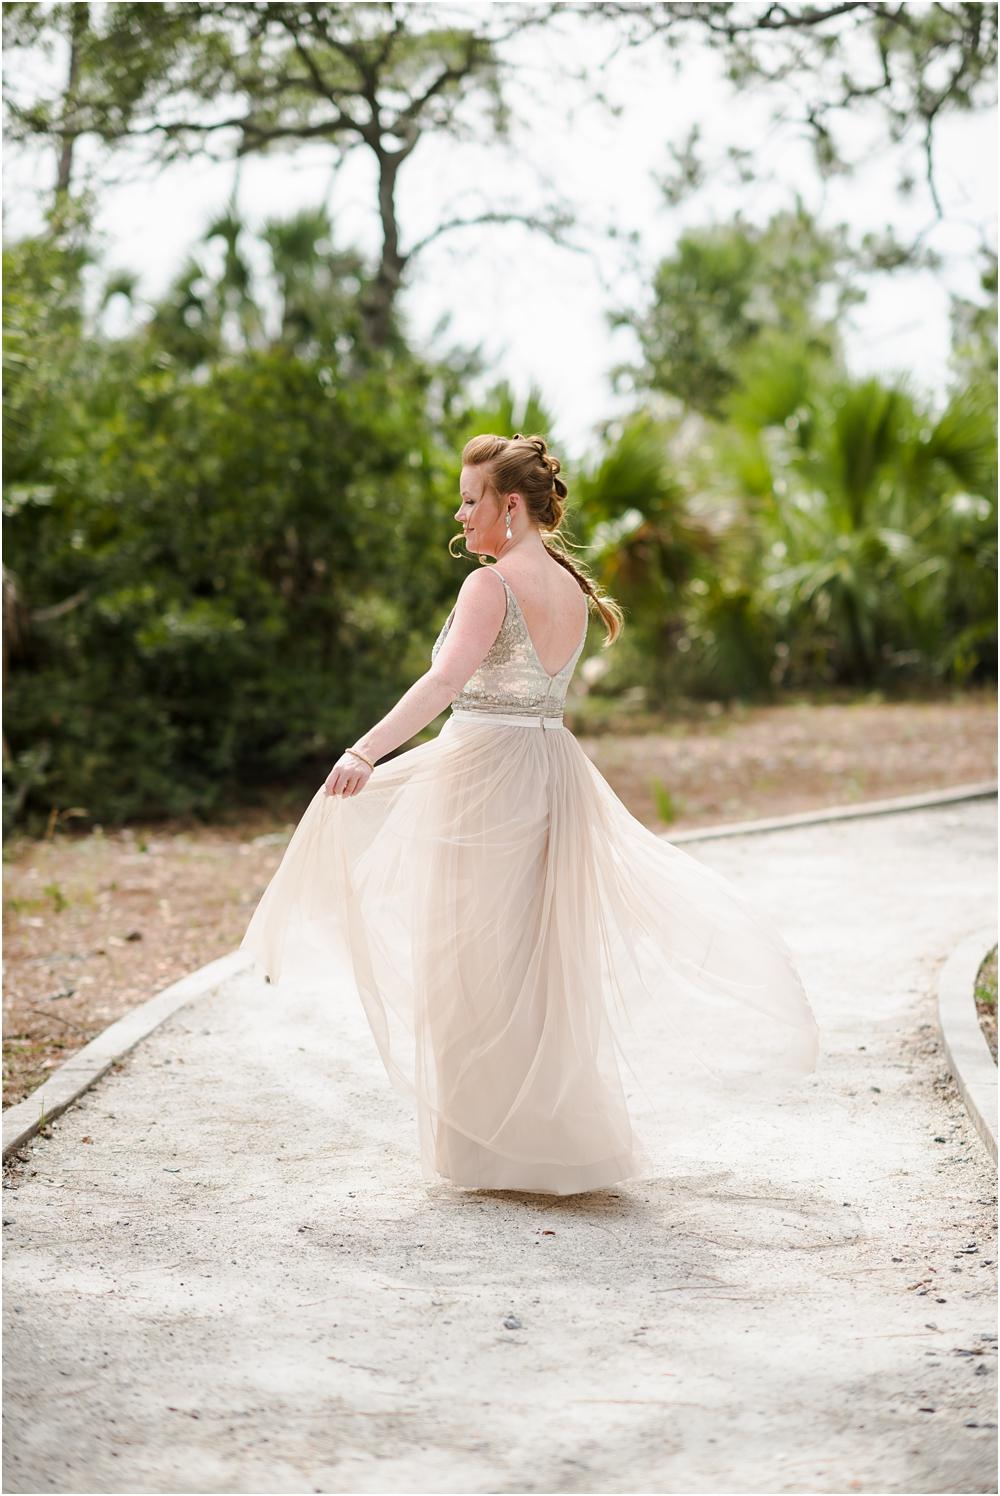 st-joe-florida-wedding-photographer-kiersten-grant-42.jpg